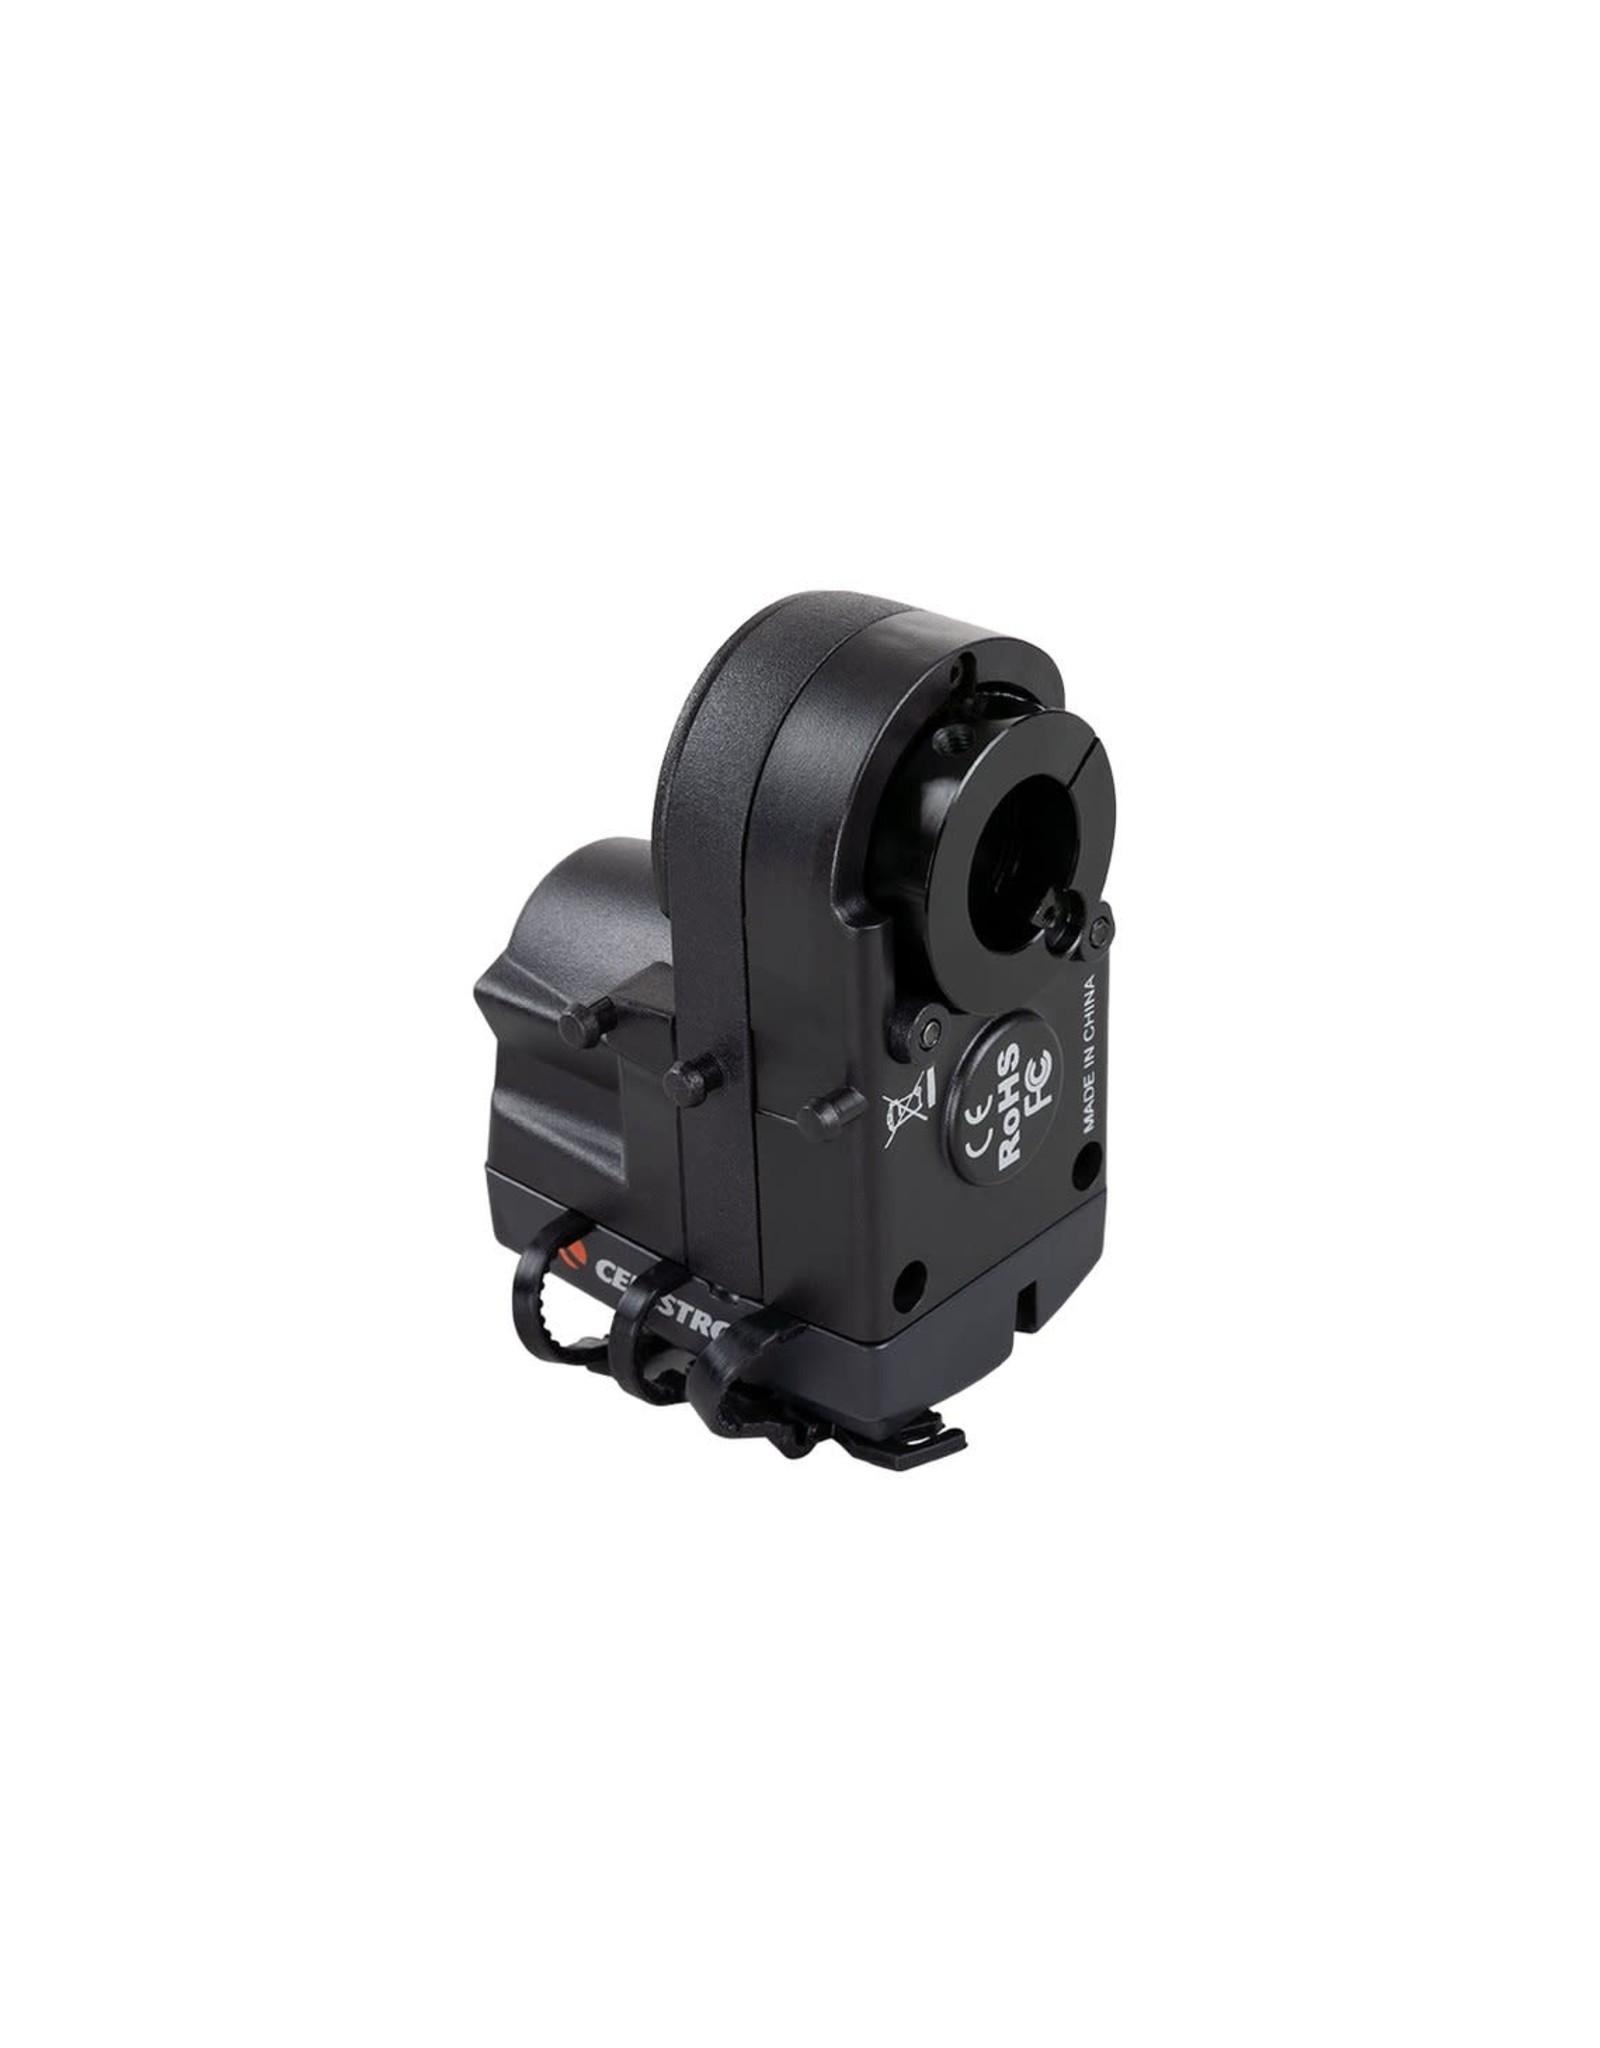 Celestron Celestron Focus Motor for SCT and EdgeHD